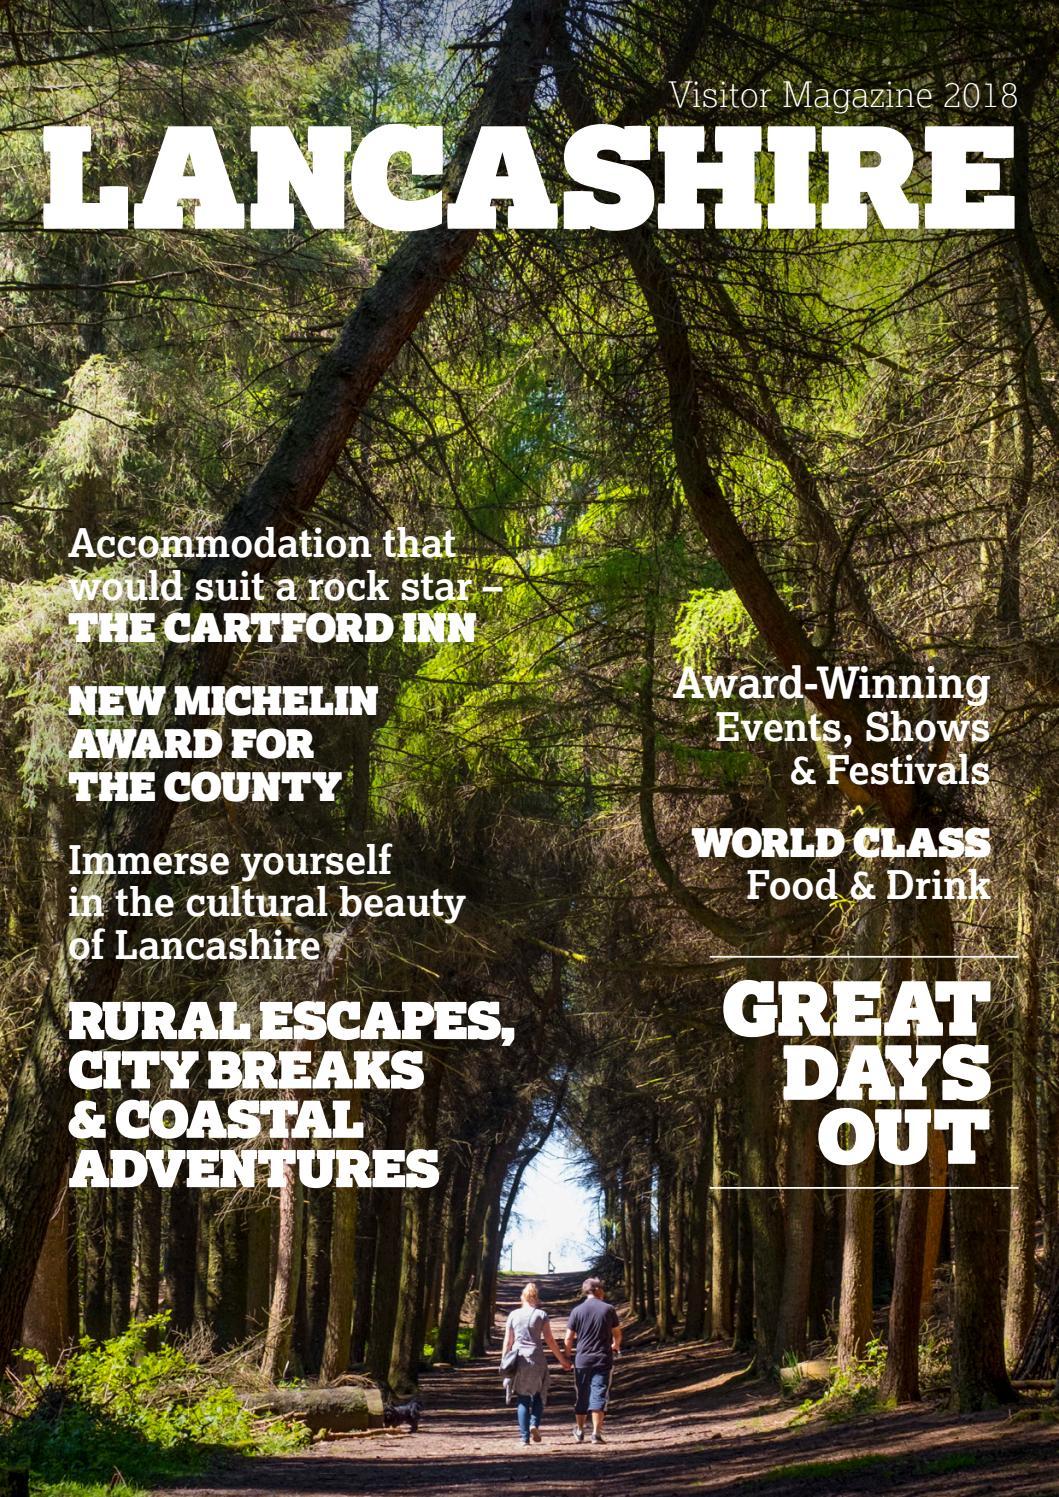 Visit Lancashire Magazine 2018 by Visit